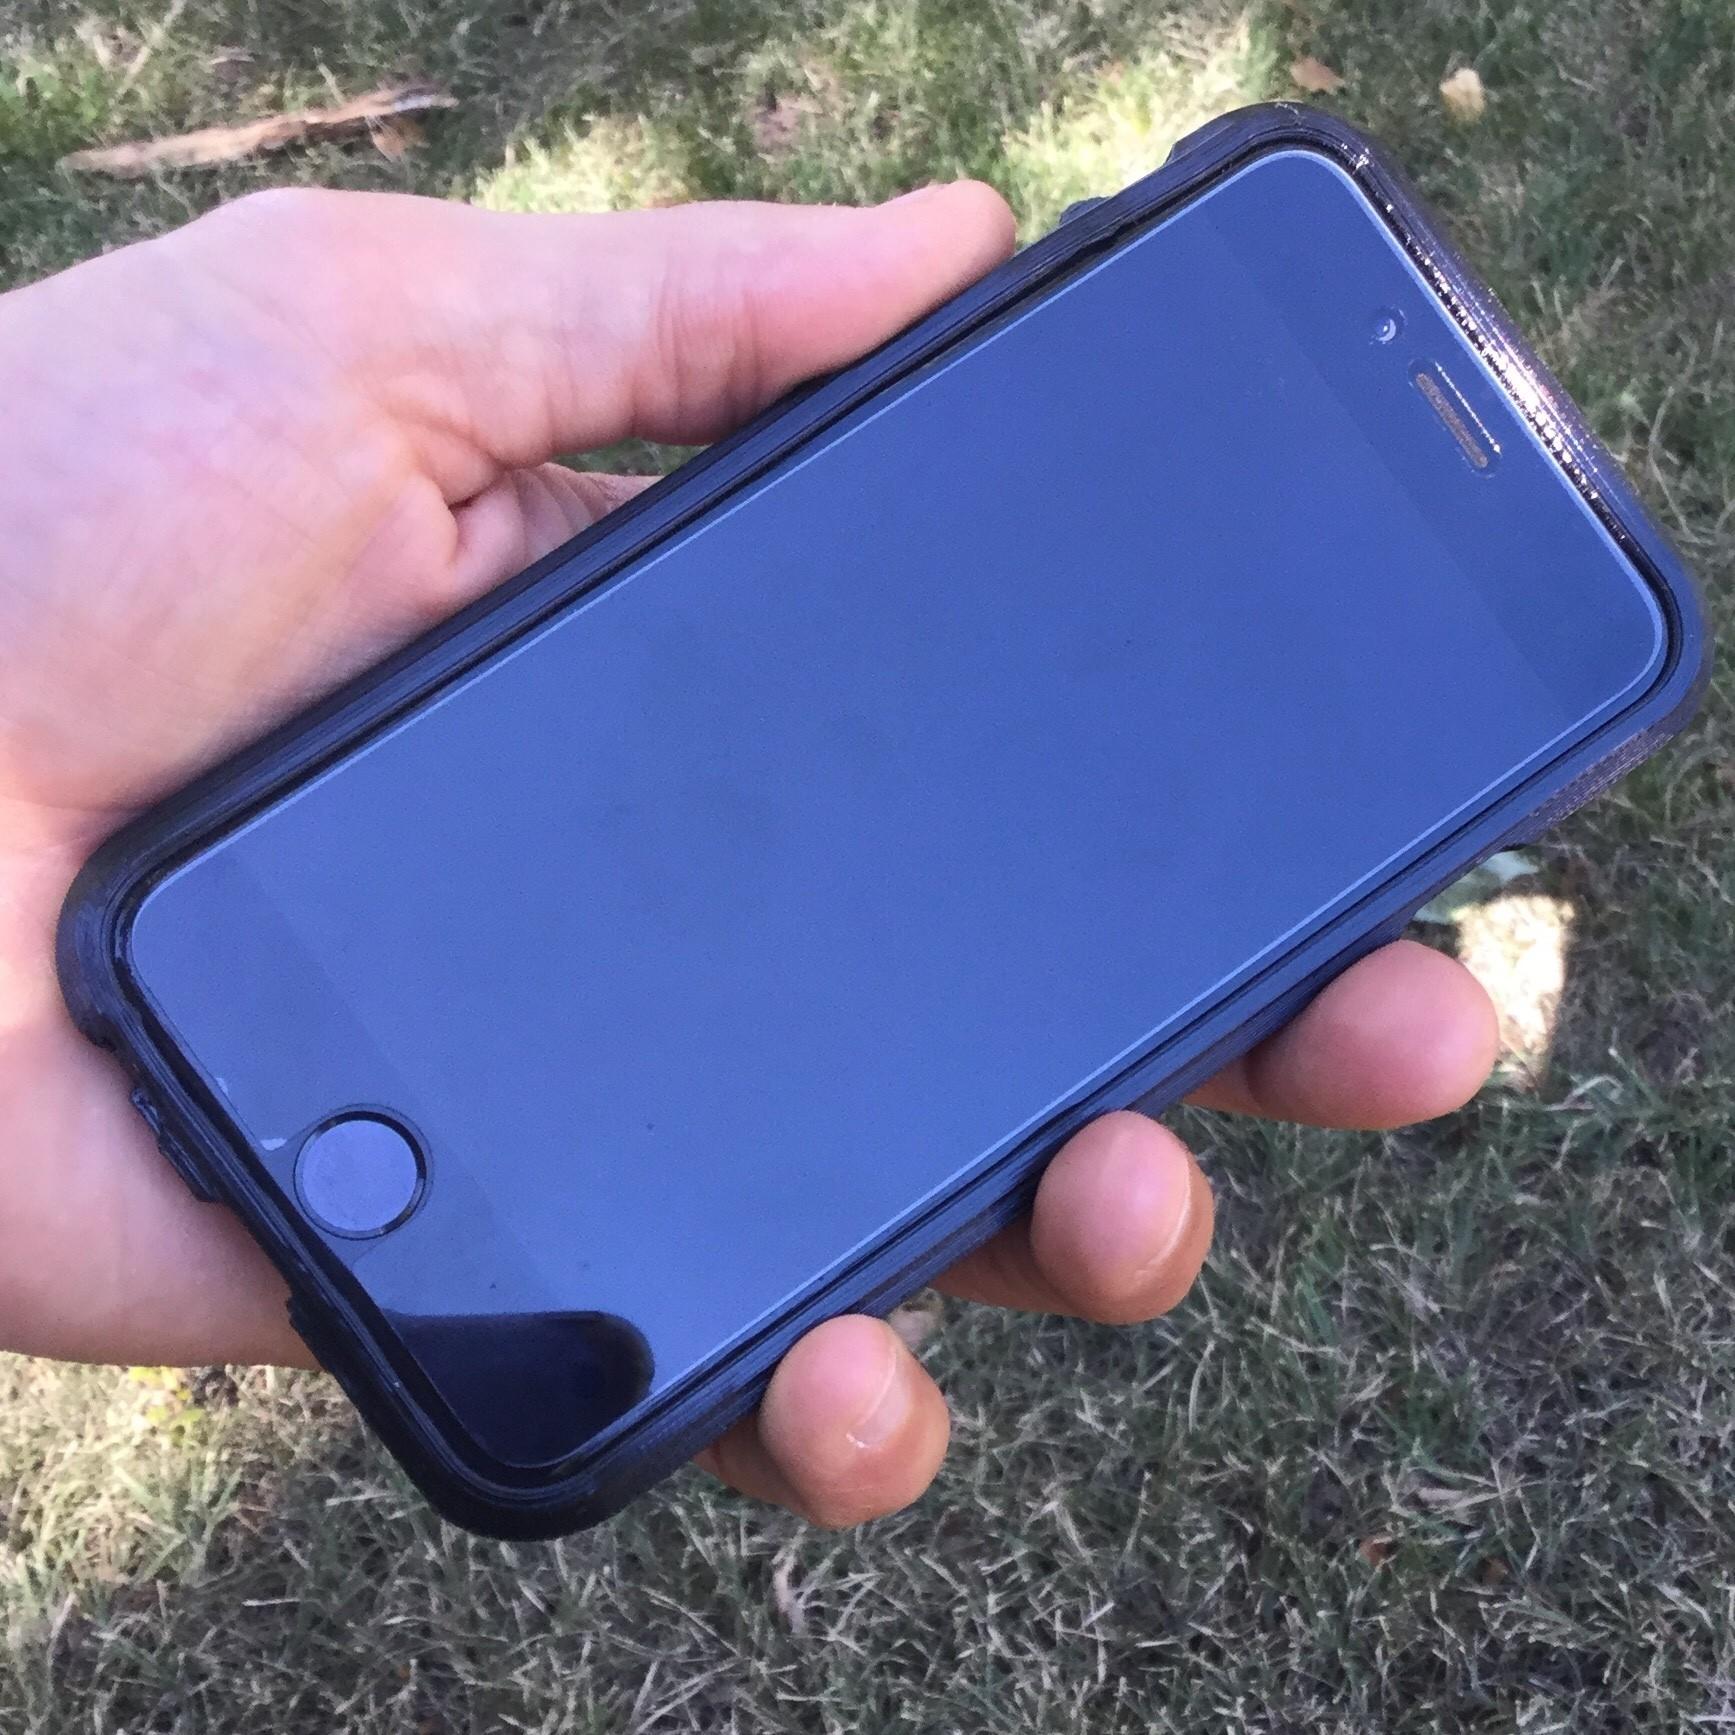 IMG_0461.JPG Download free STL file Map Phone Case - Boulder, CO • Model to 3D print, BryanTheLion